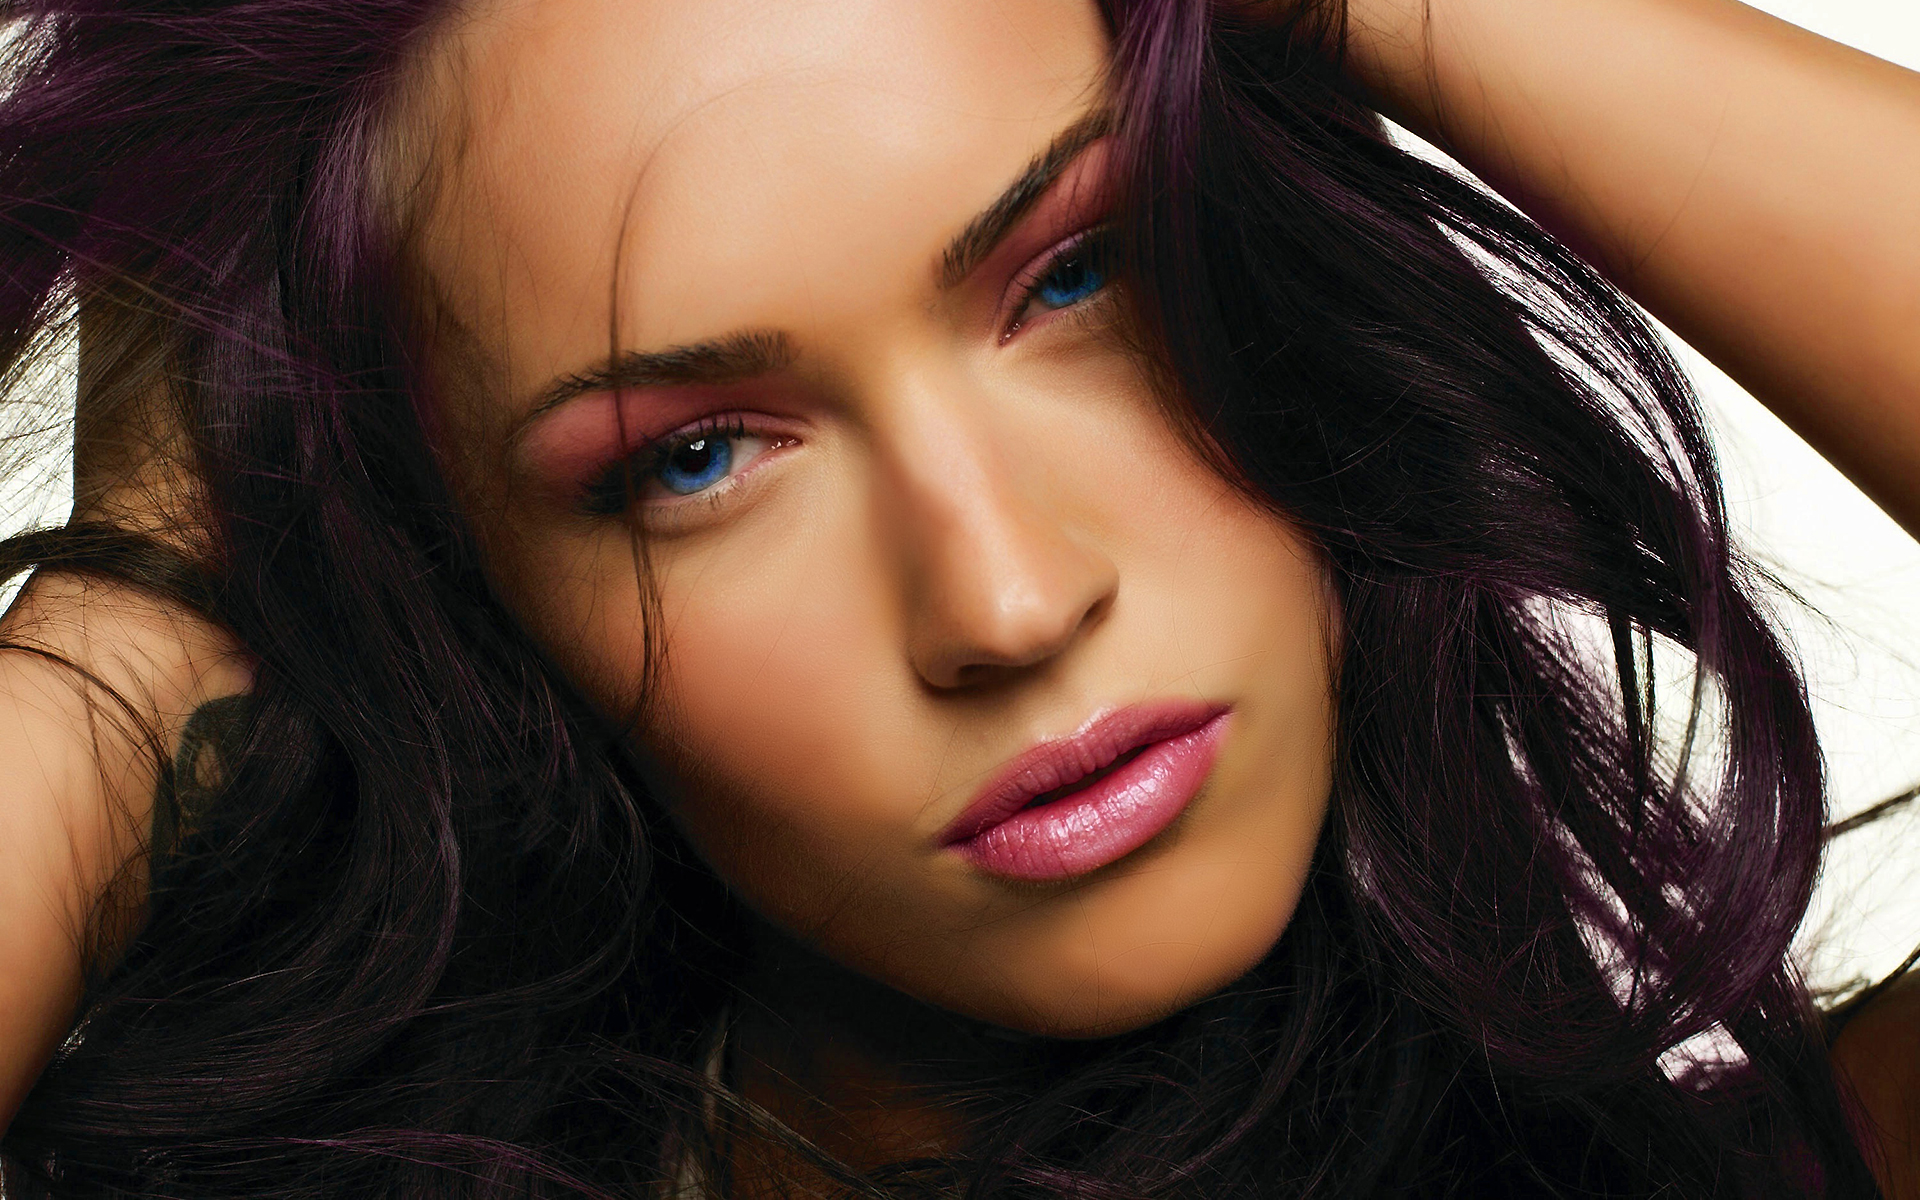 Megan fox hot face